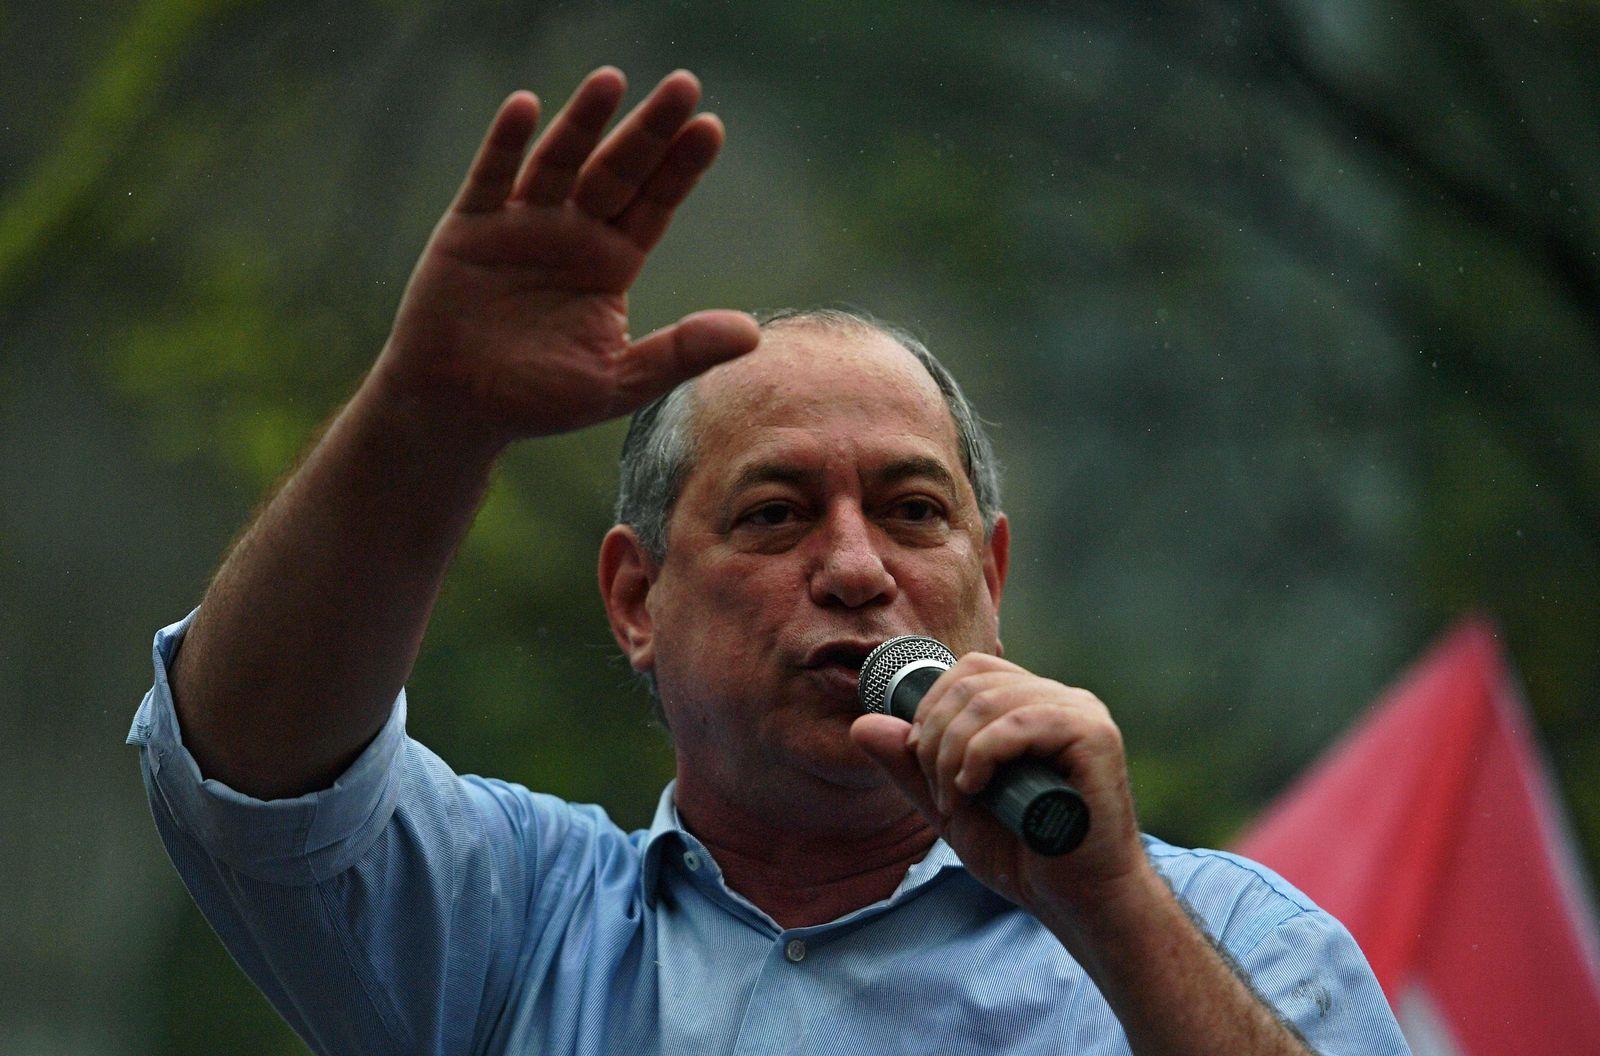 Ciro Gomes / Wahl Brasilien